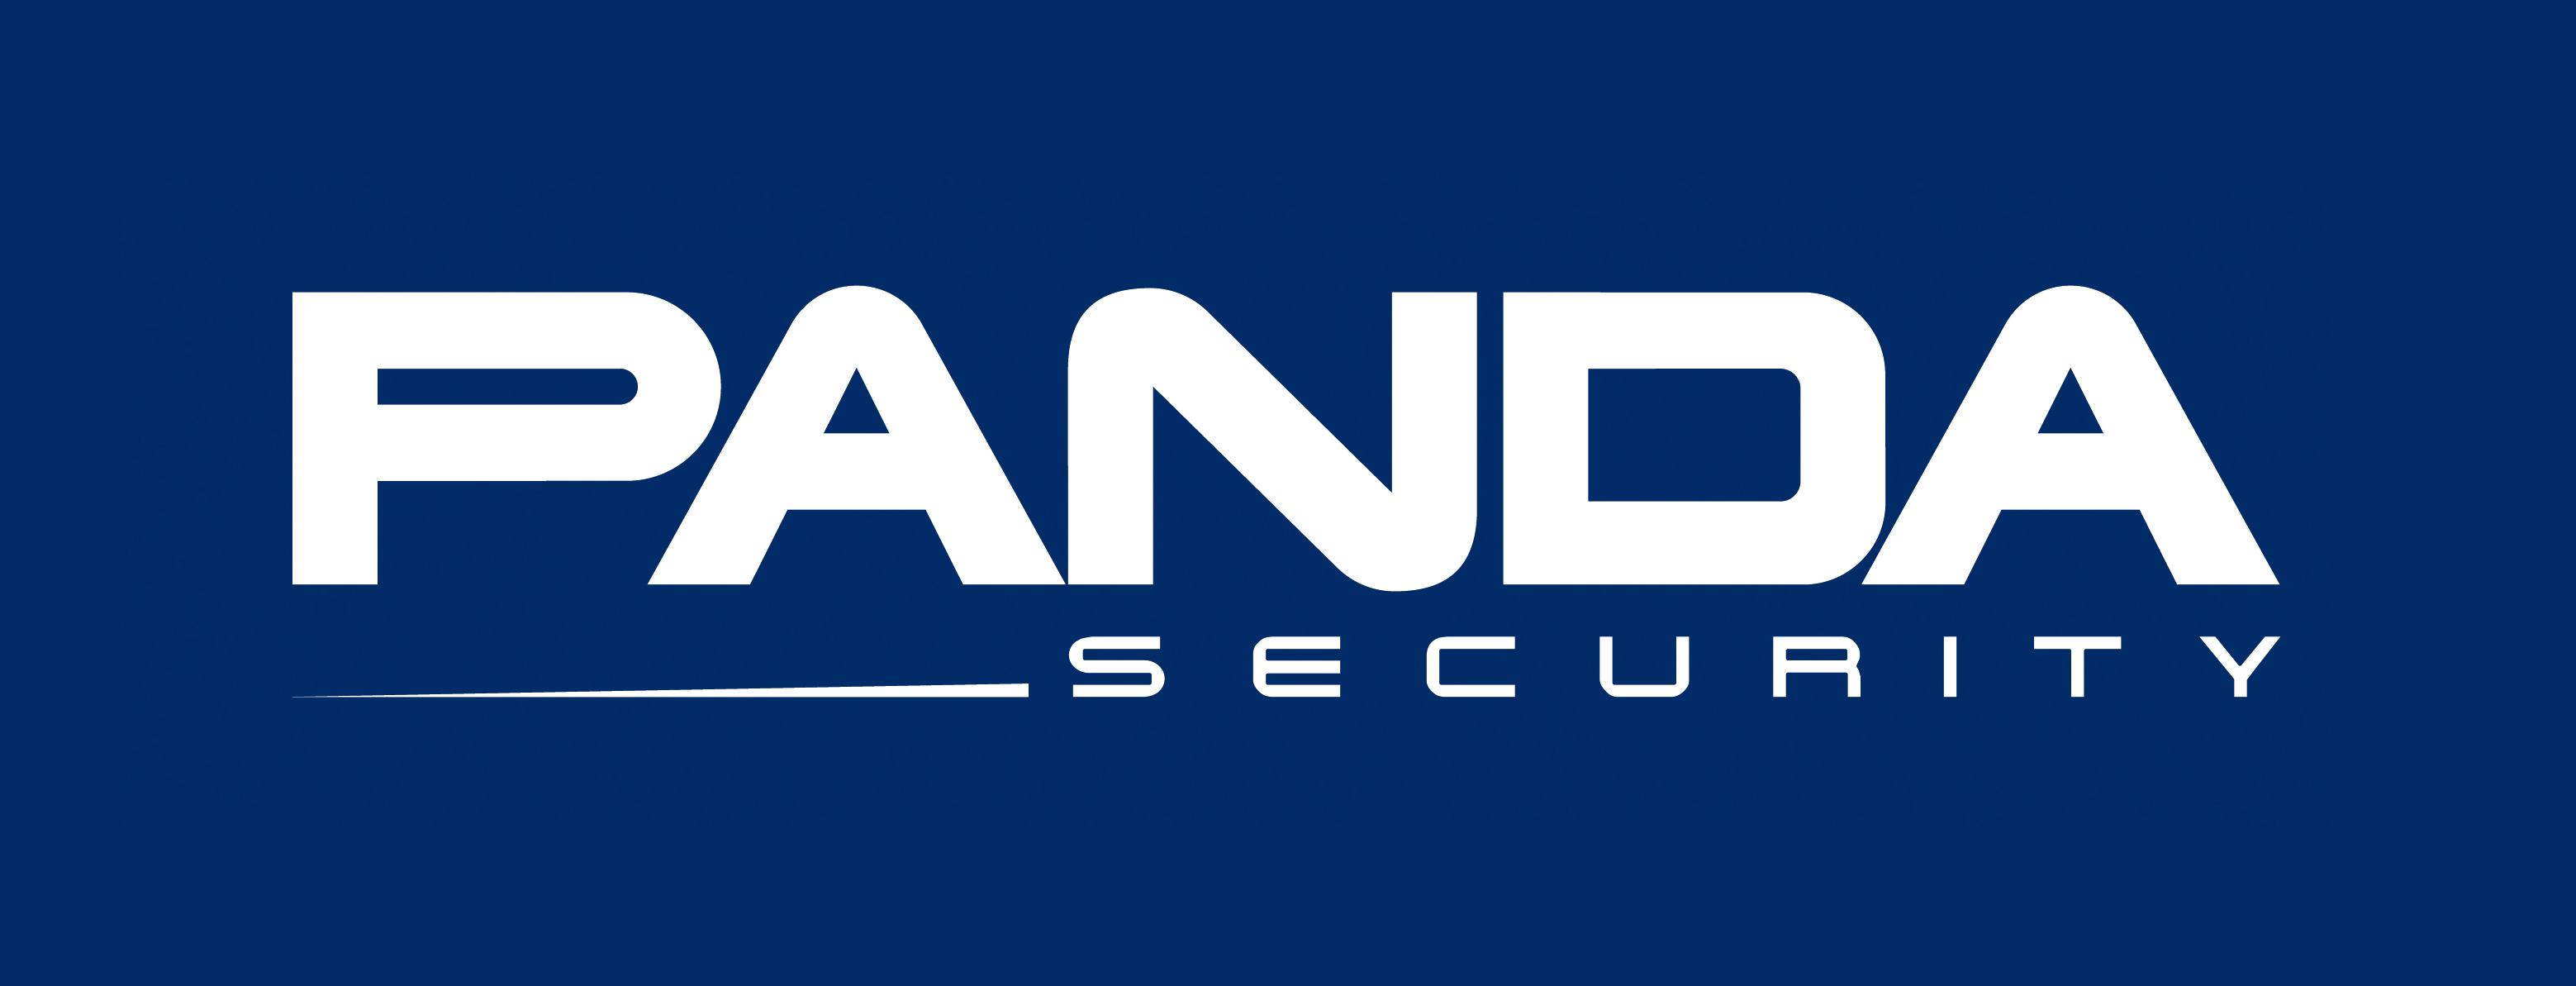 File:Panda Security Logo.jpg - Wikimedia Commons